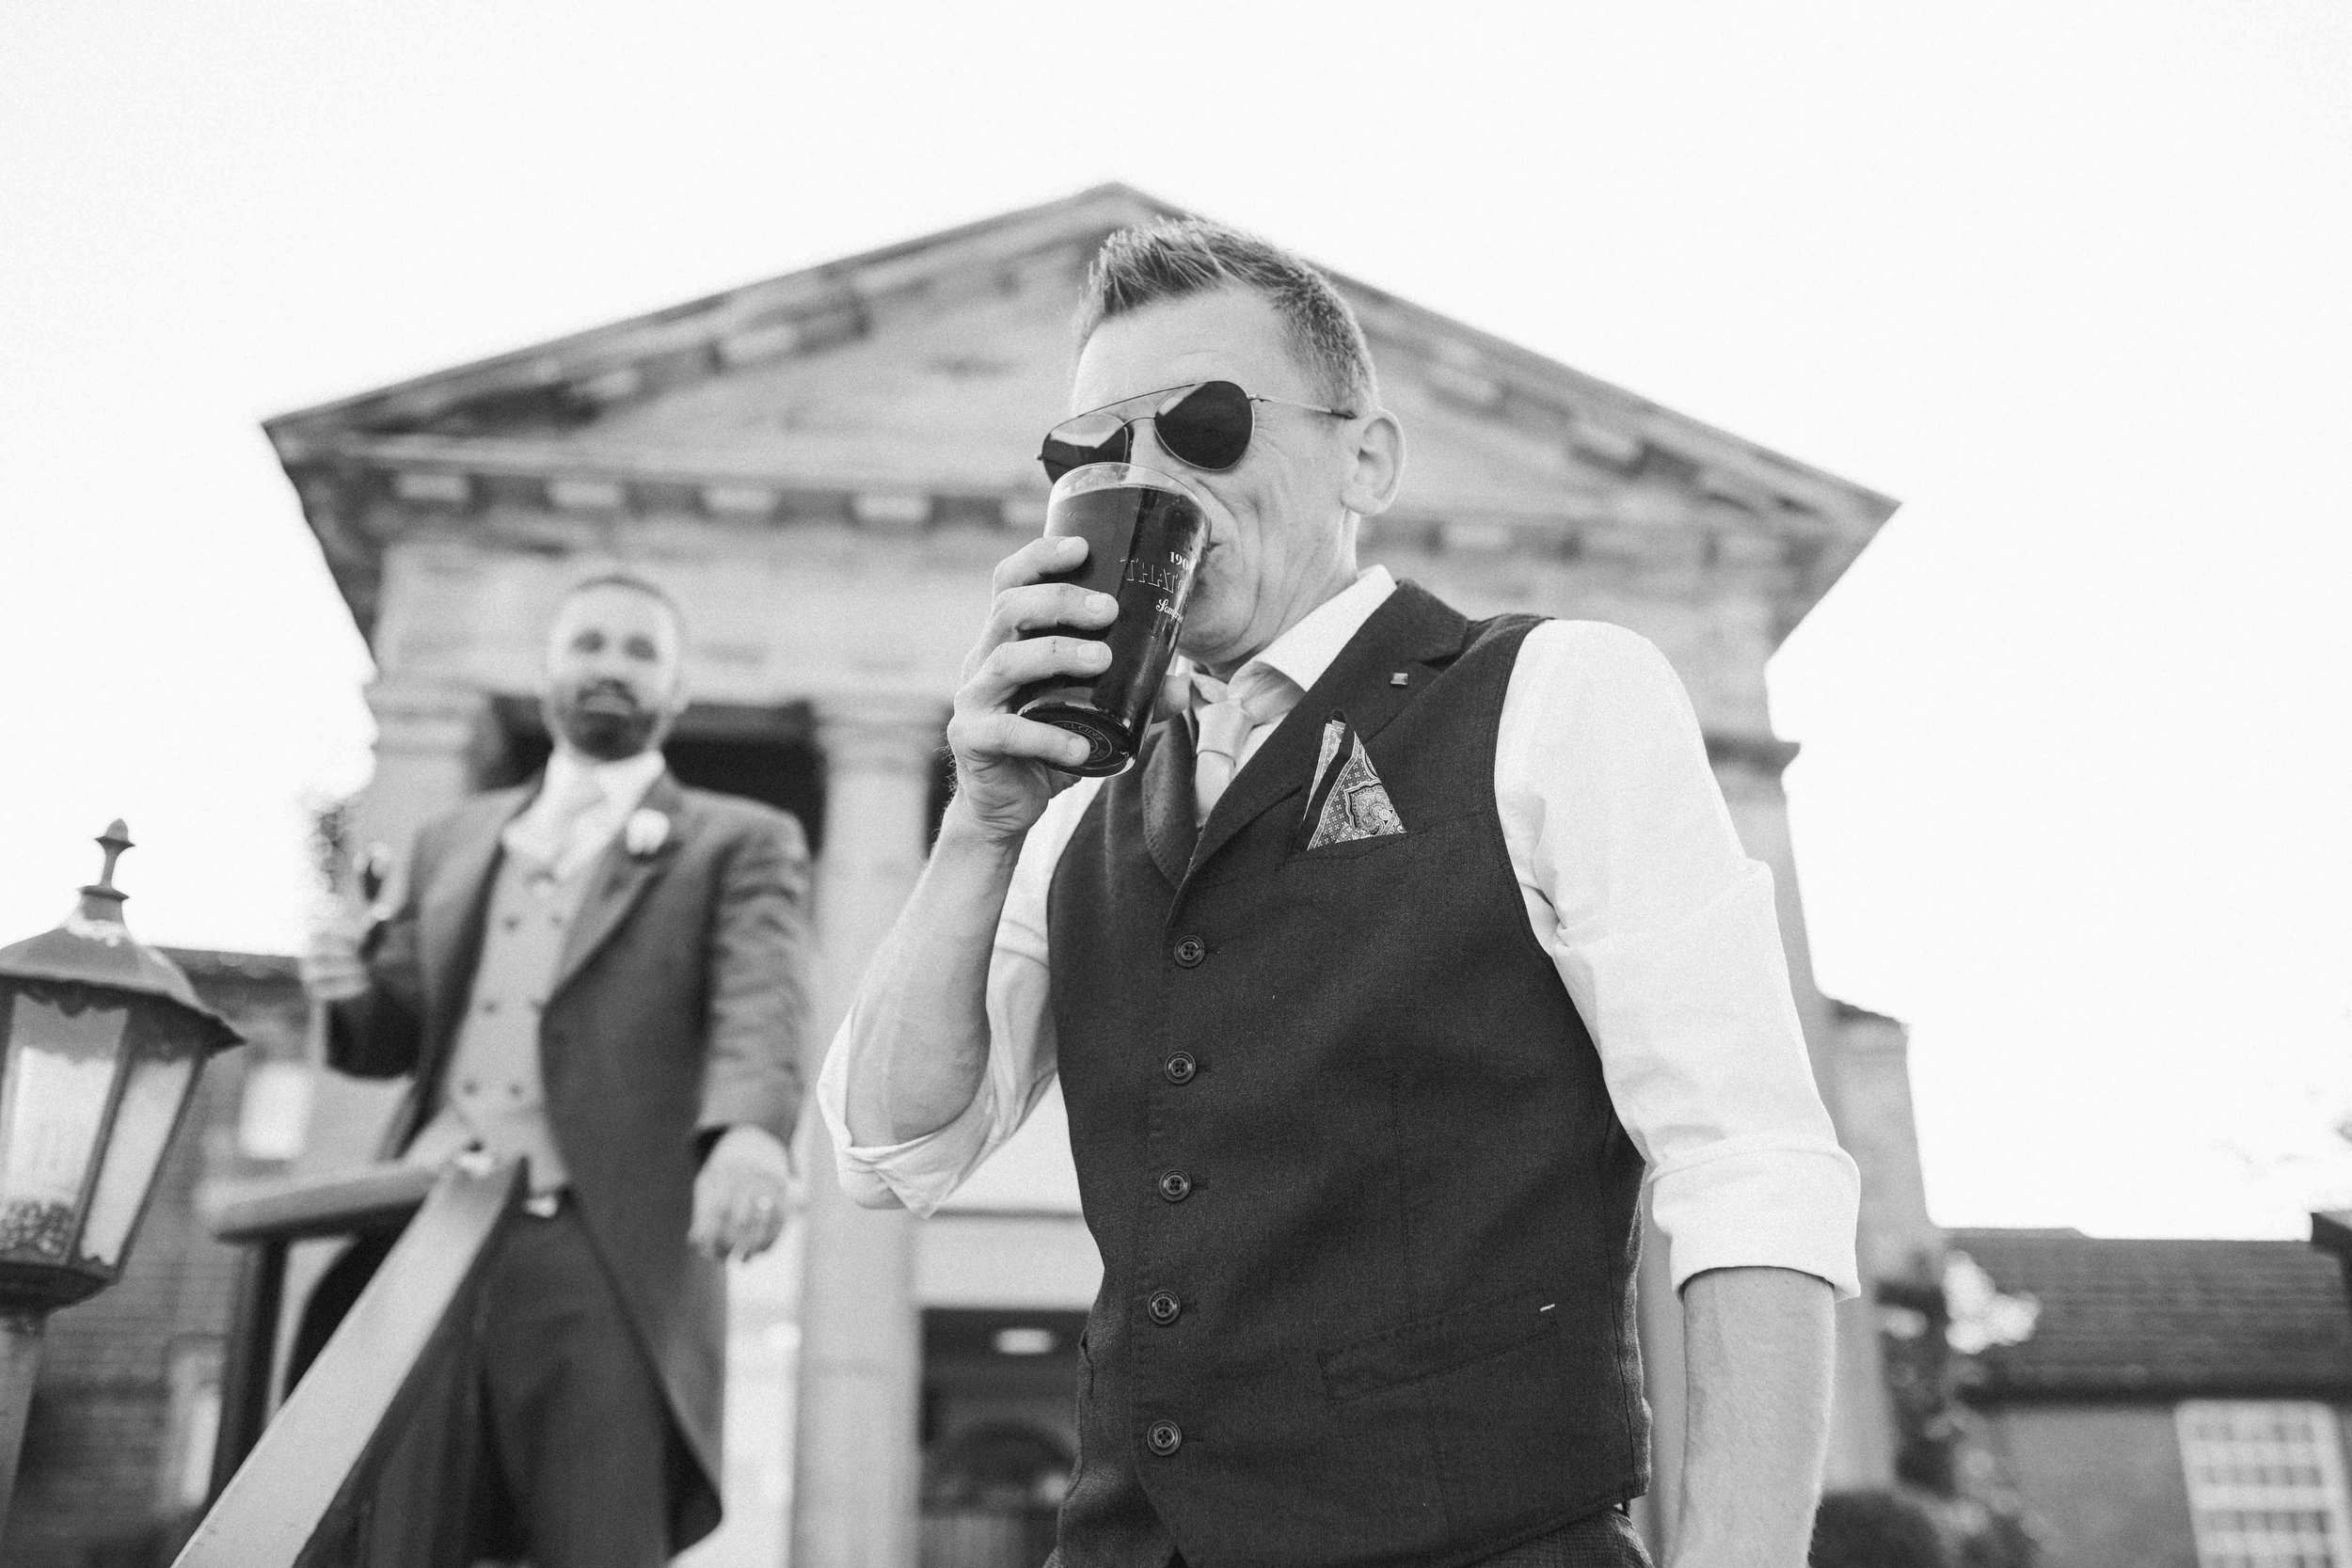 Lea-cooper-photography-wedding-photography-wolverhampton-patshull-park-hotel-wedding-pattingham-wolverhampton-west-midlands-uk-13.JPG